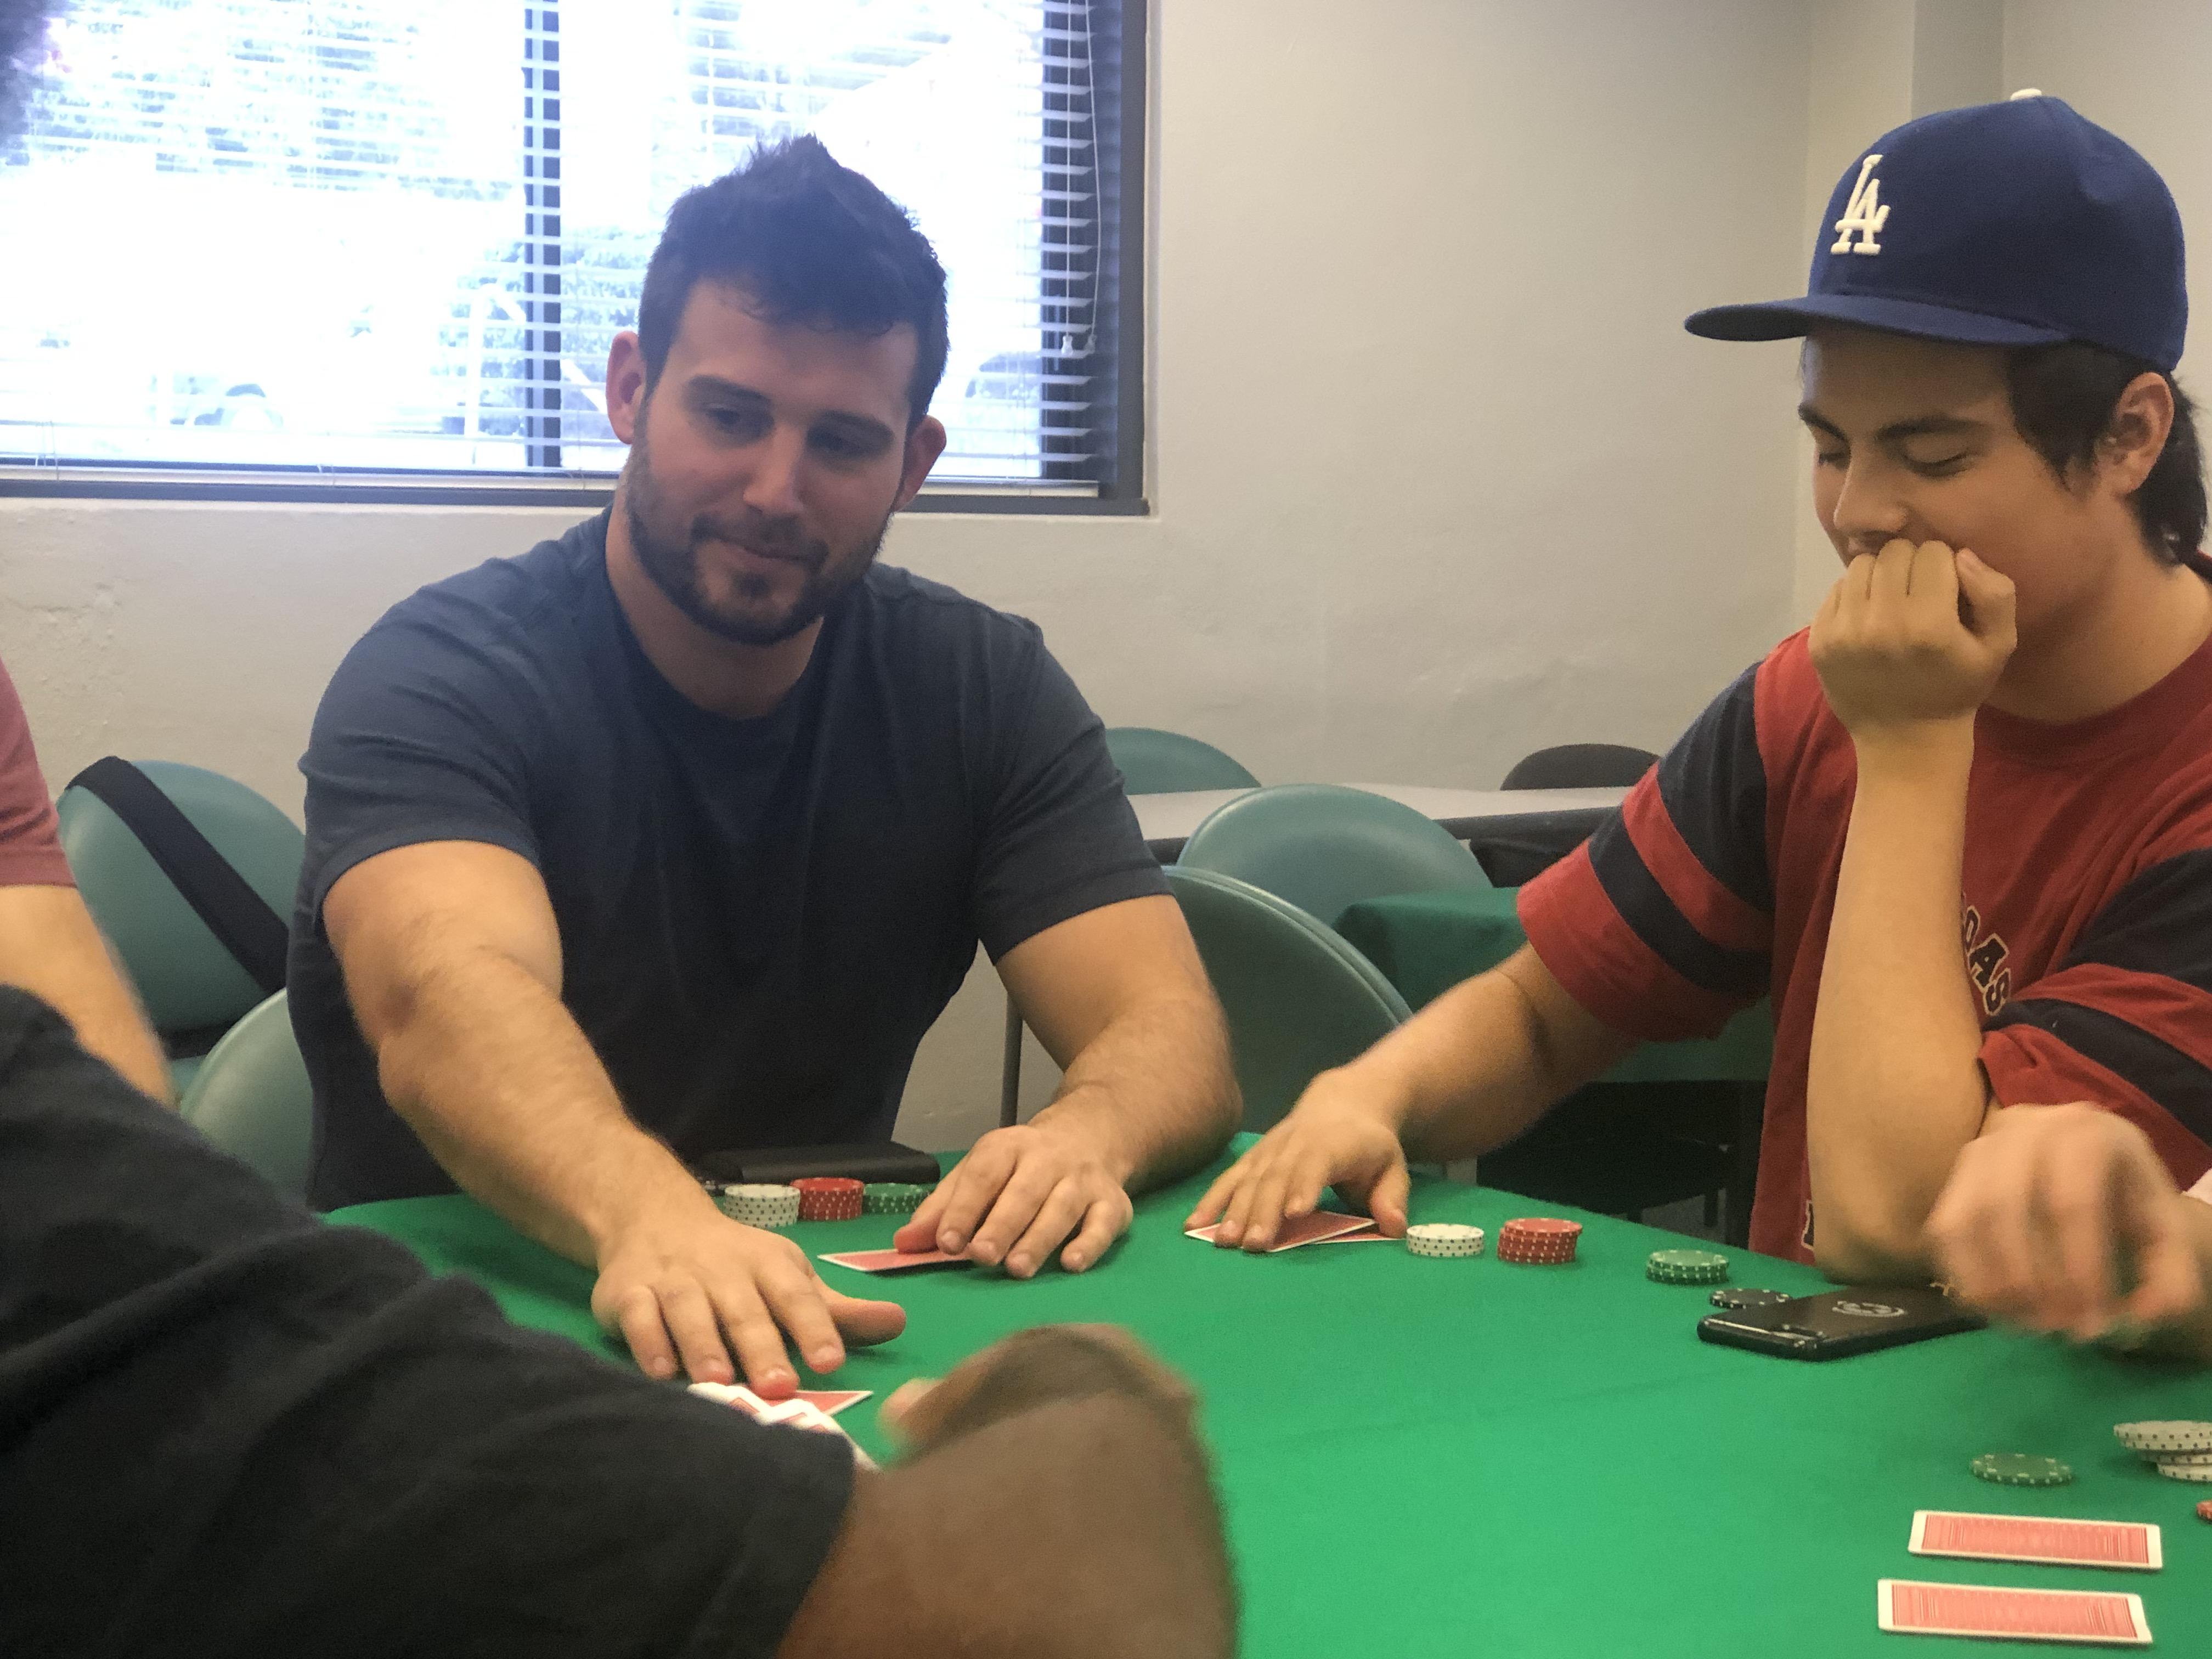 Darren Elias WPT LA Poker Classic